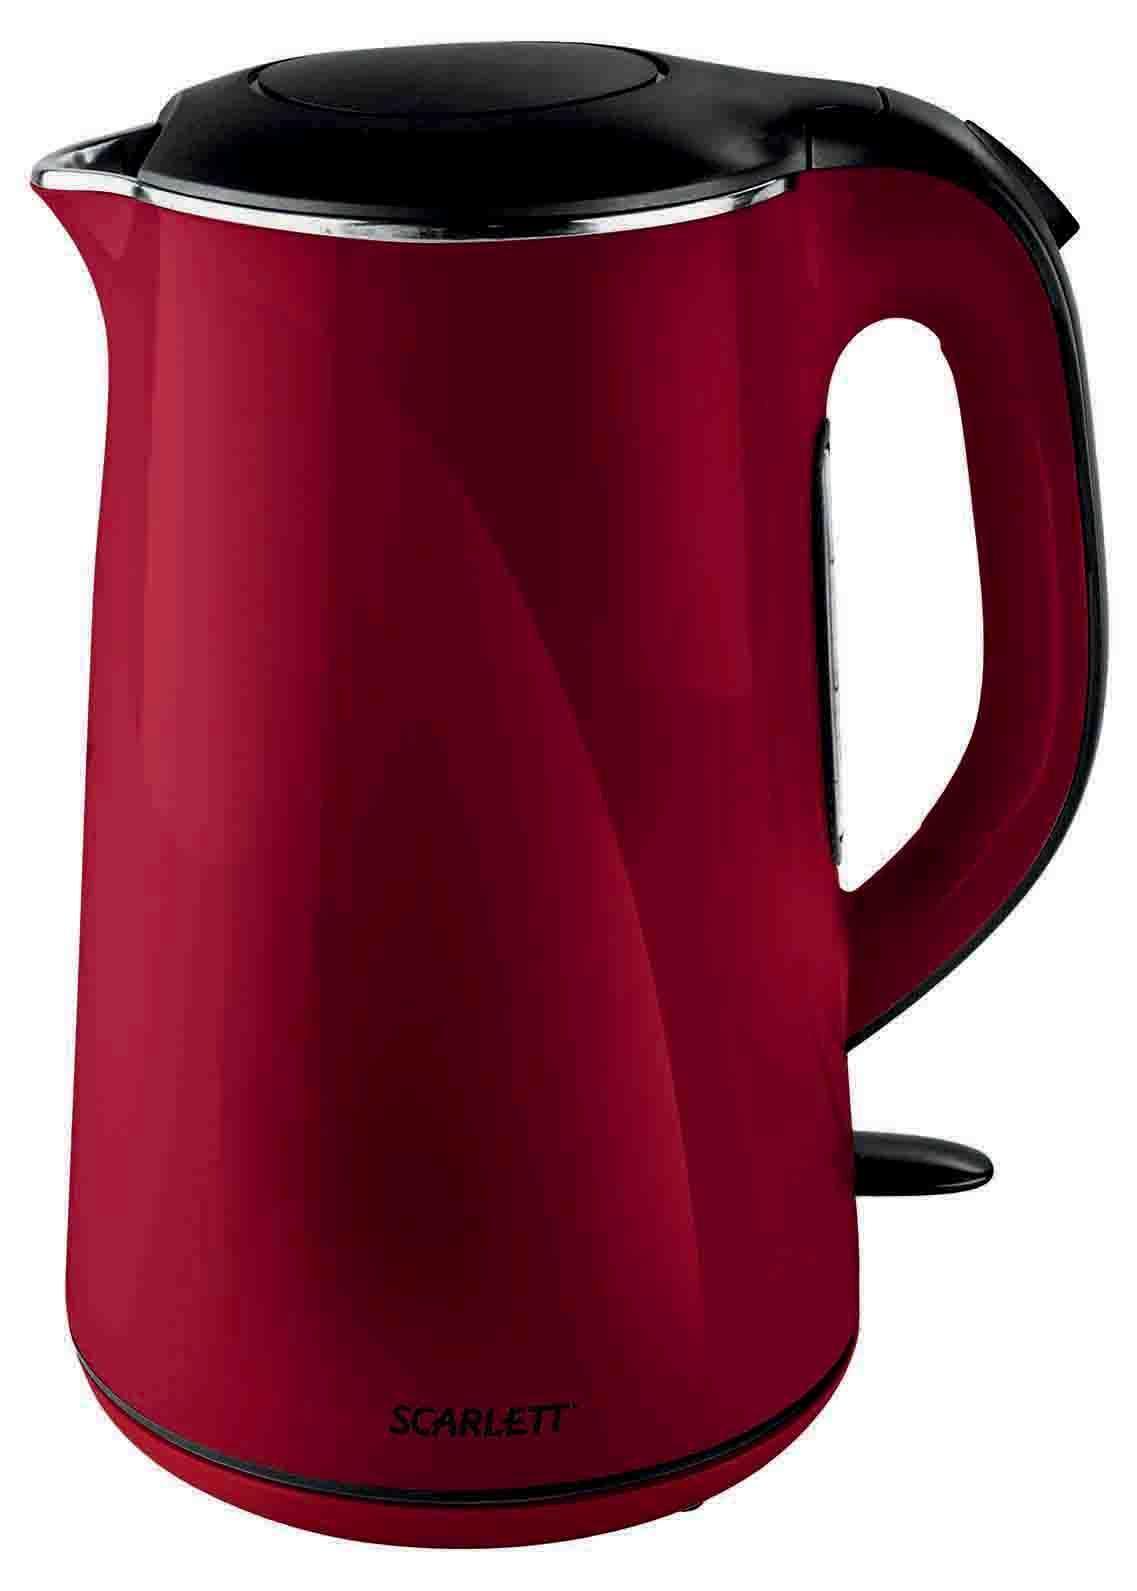 Scarlett SC-EK21S05 электрический чайник